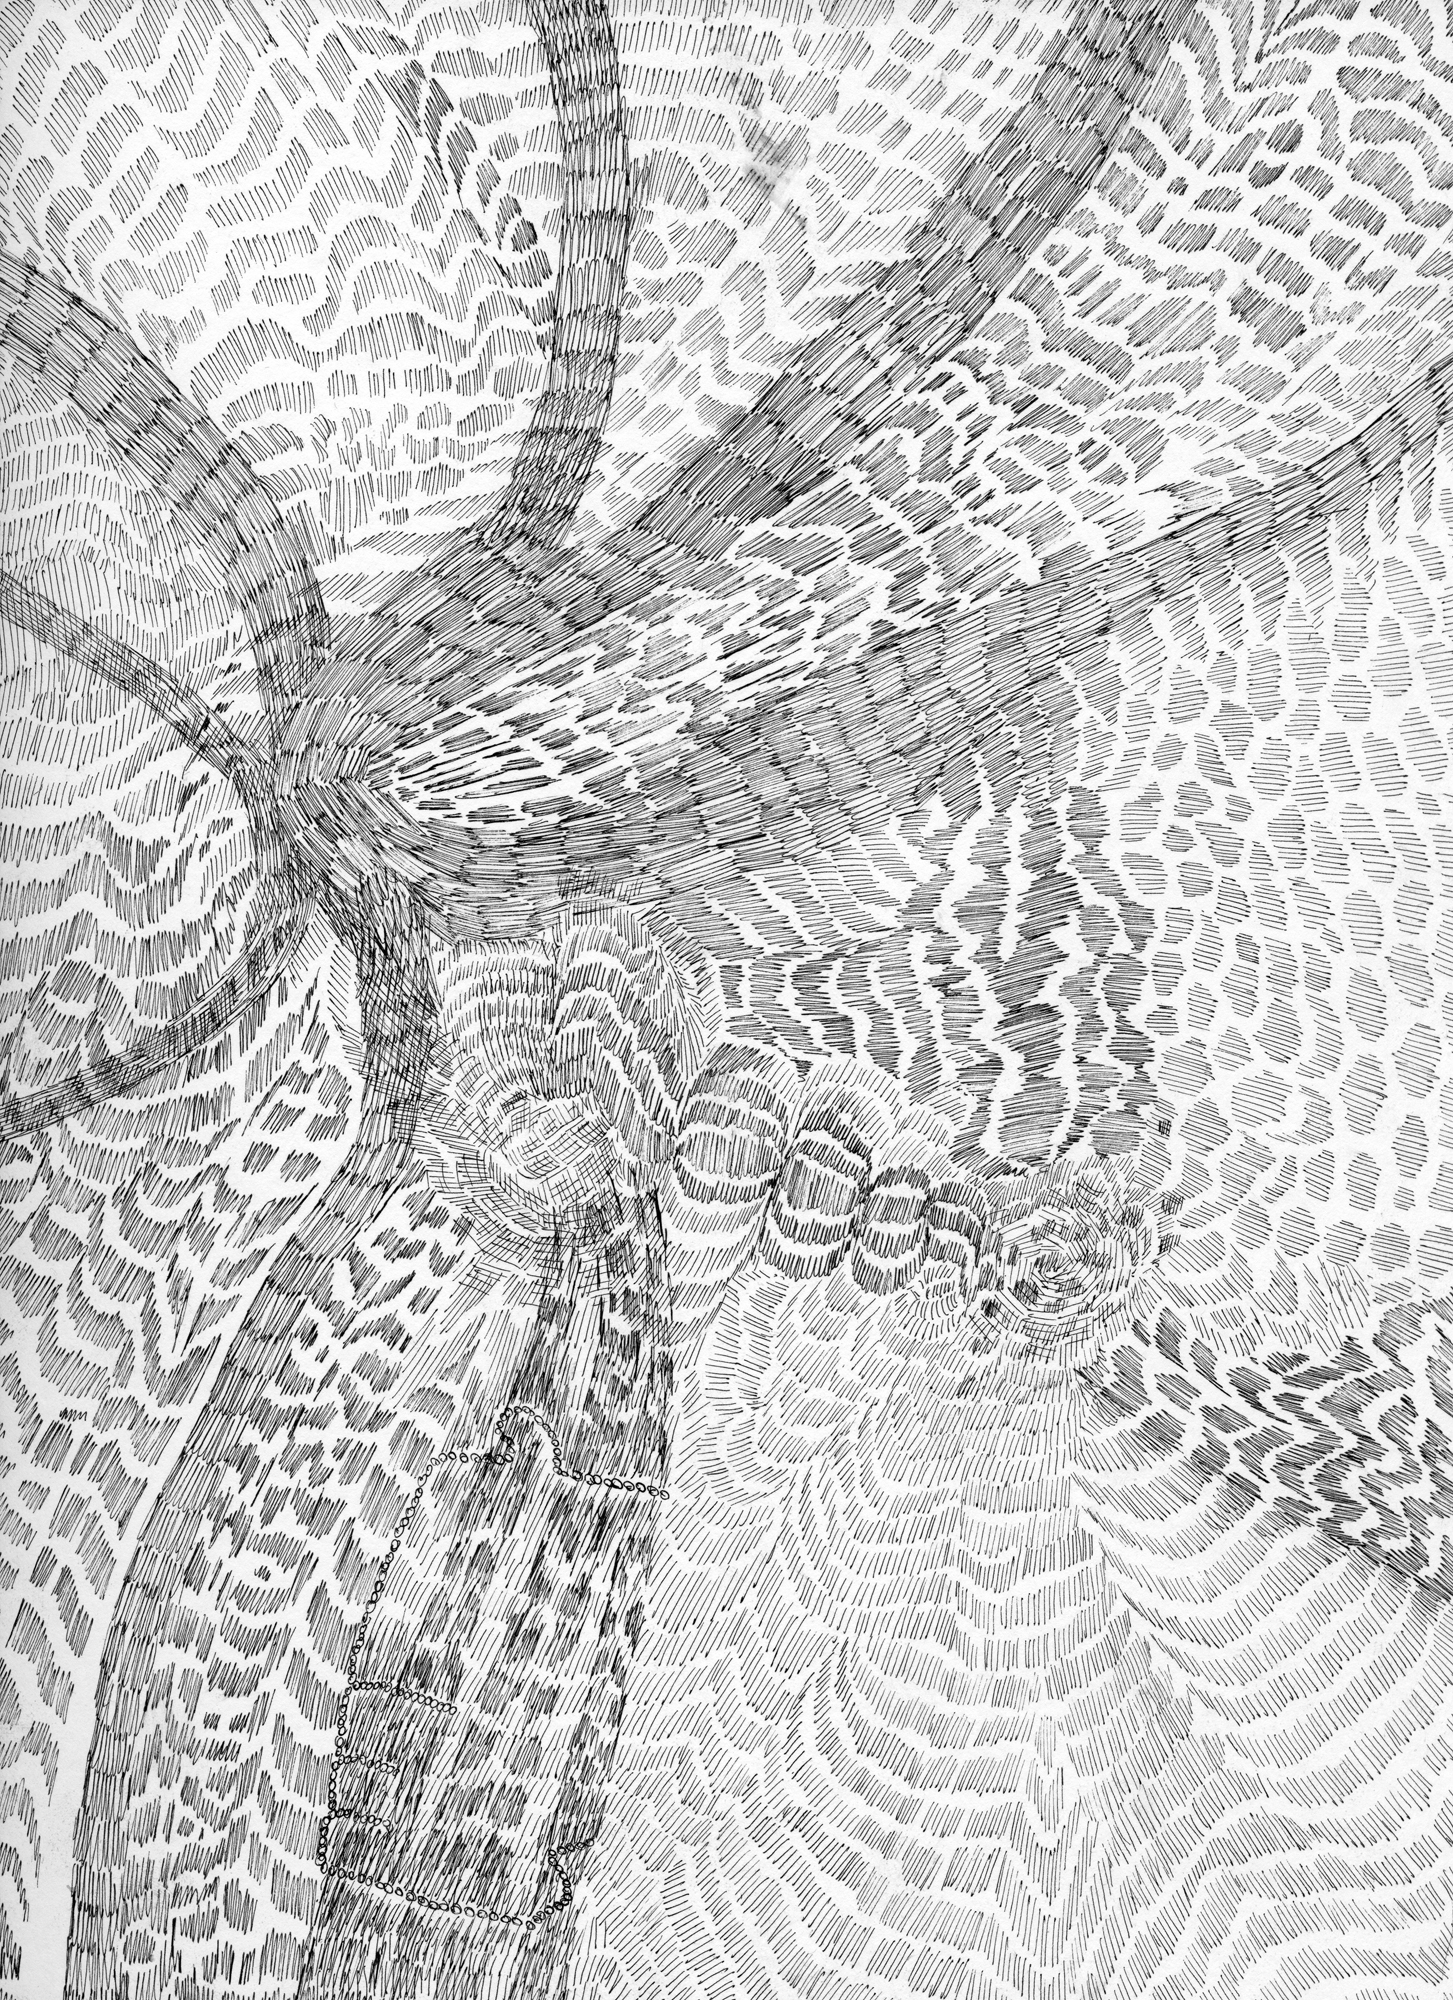 Untitled (Flux 04.19) , 2019 Ink on paper 30.4 cm x 22.8 cm